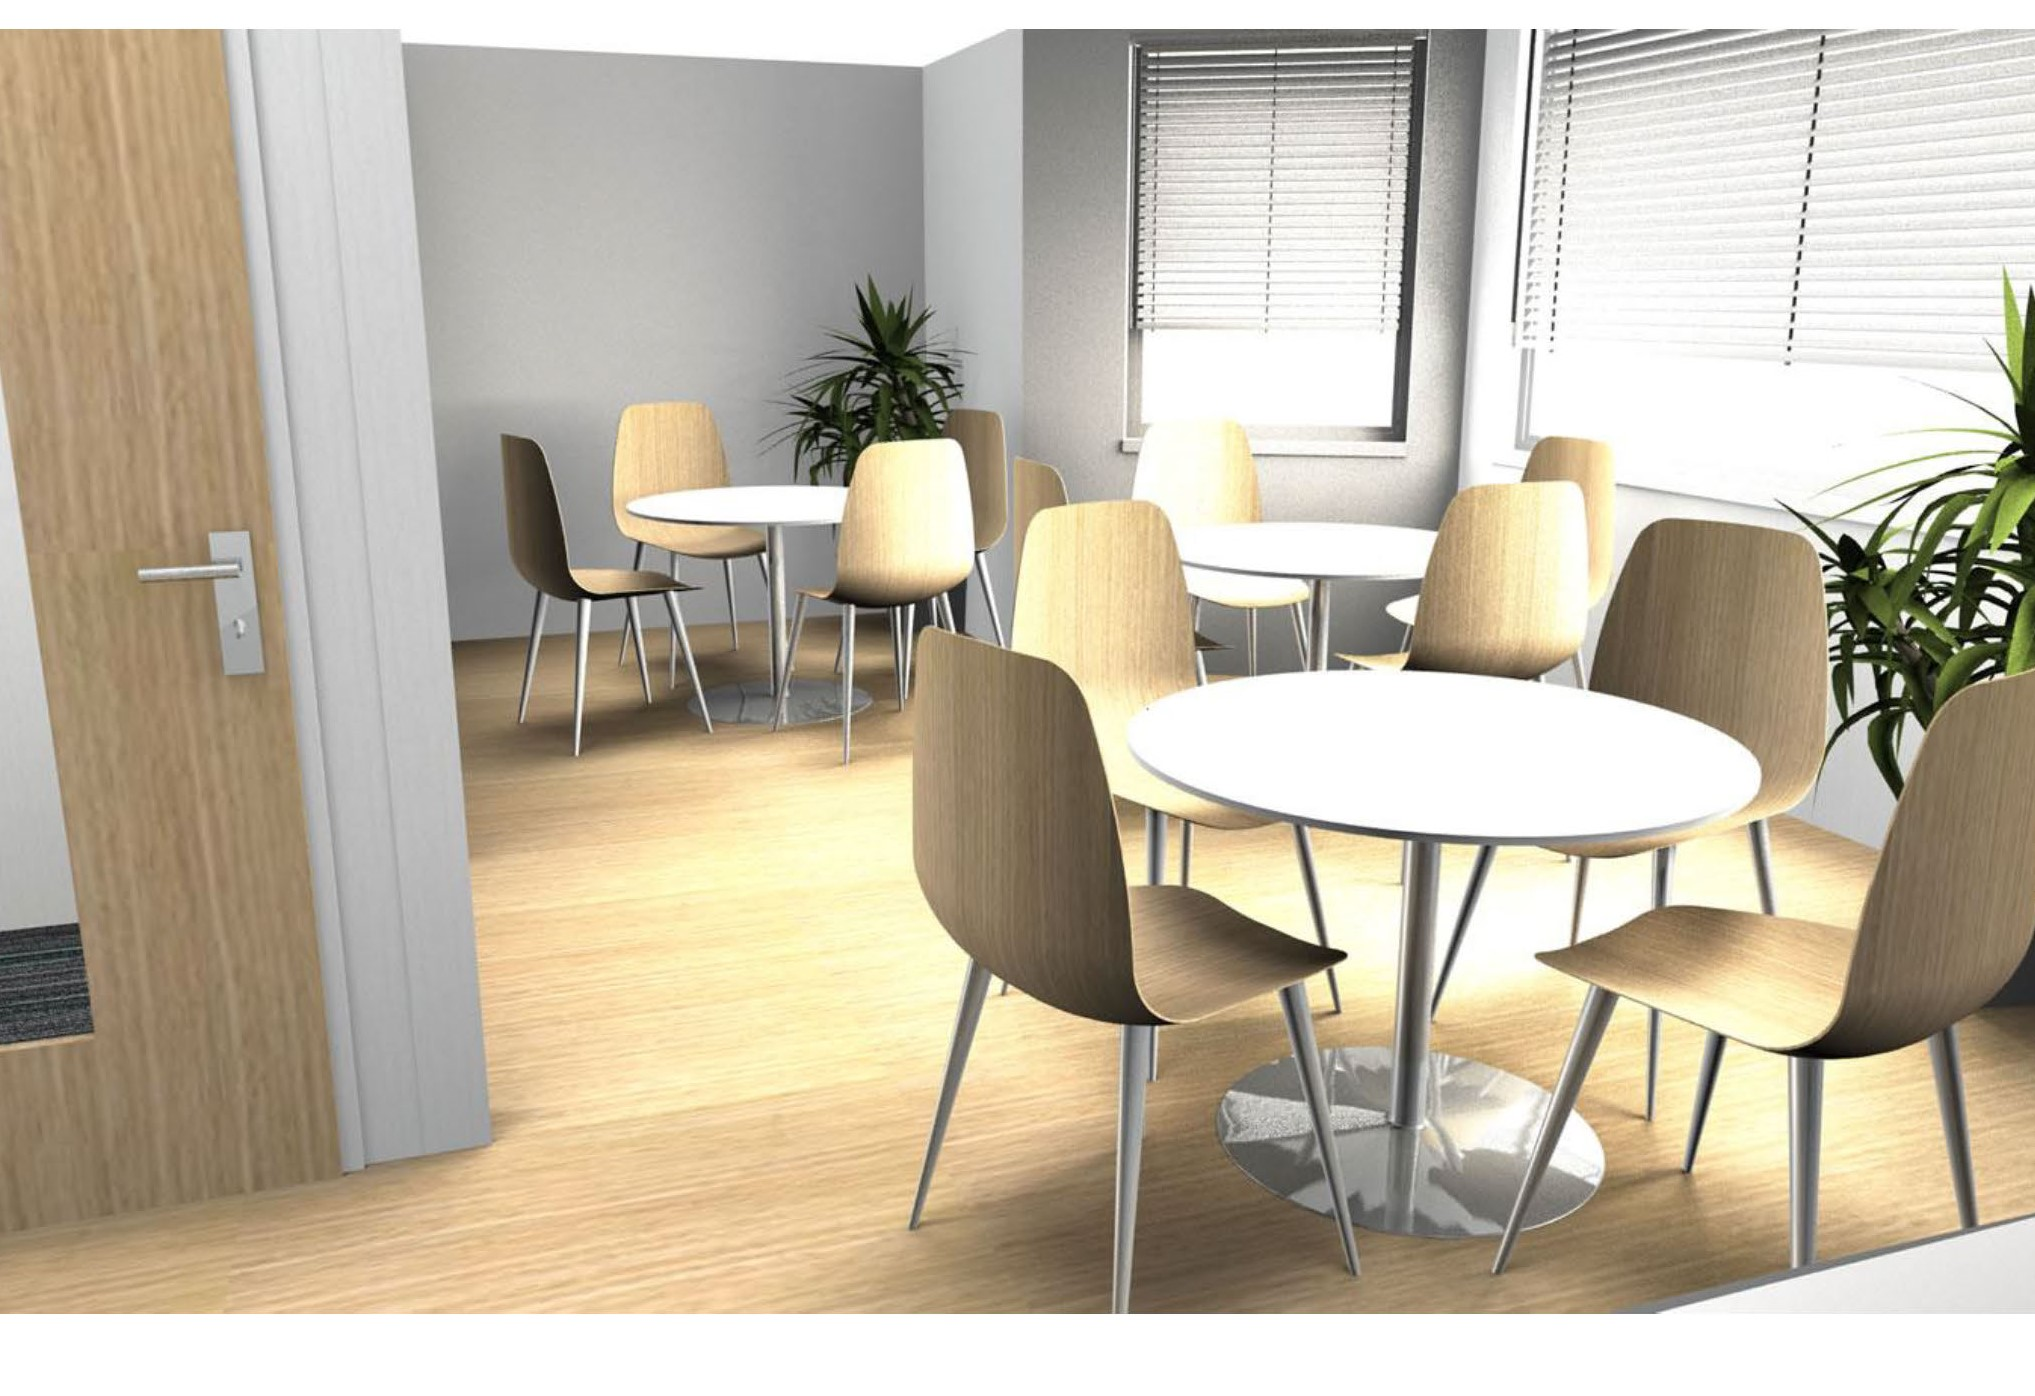 interior-design-billingshurst-1.jpg